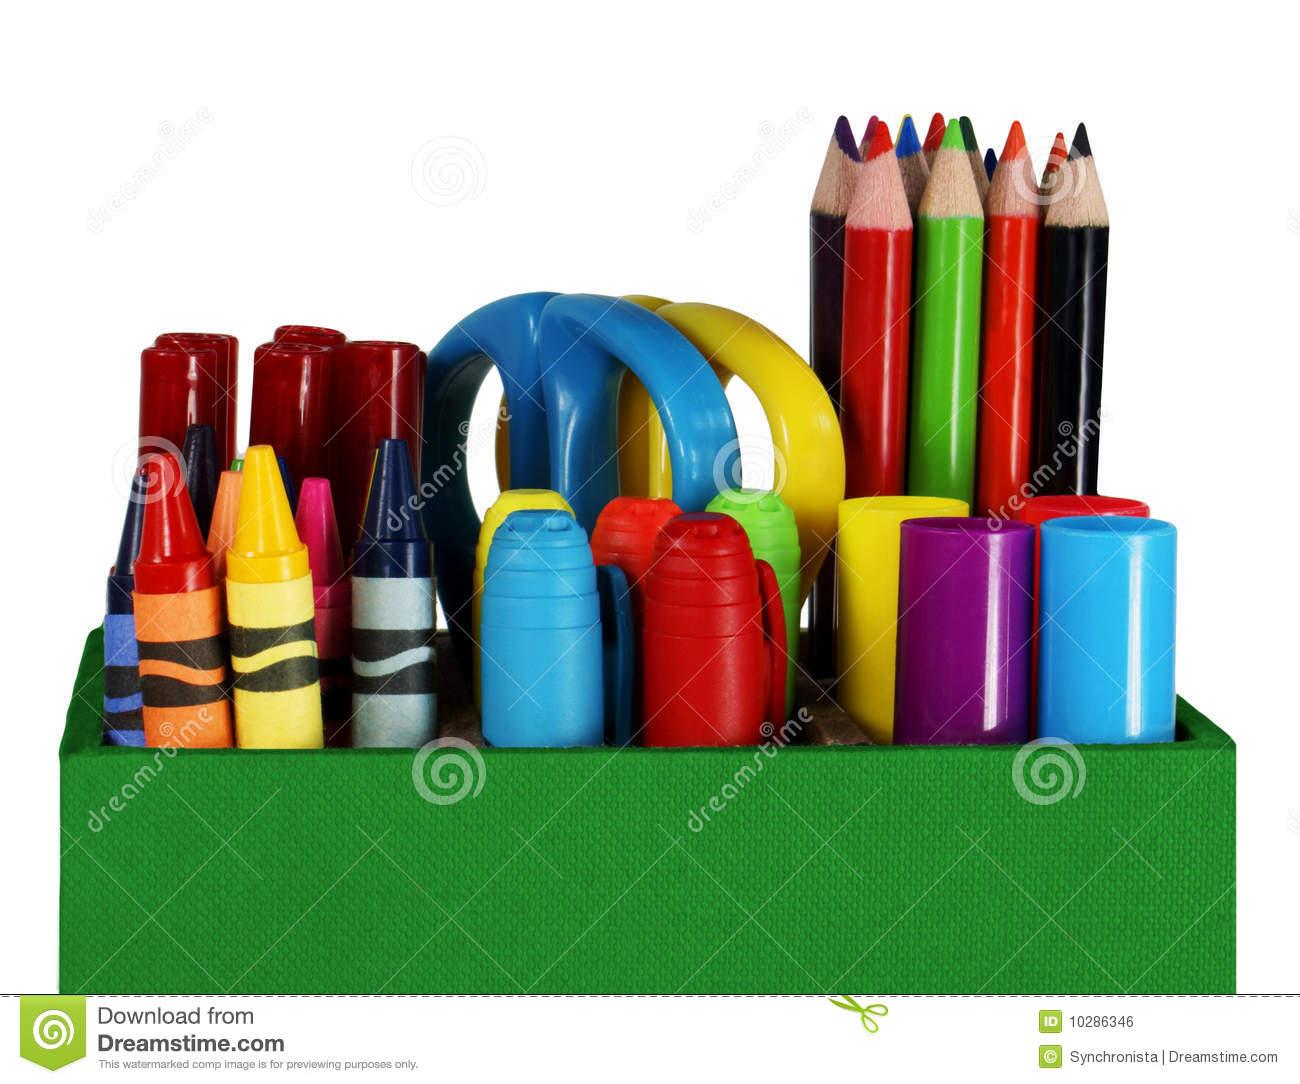 Crayon colored pencil clipart 20 free Cliparts | Download ...